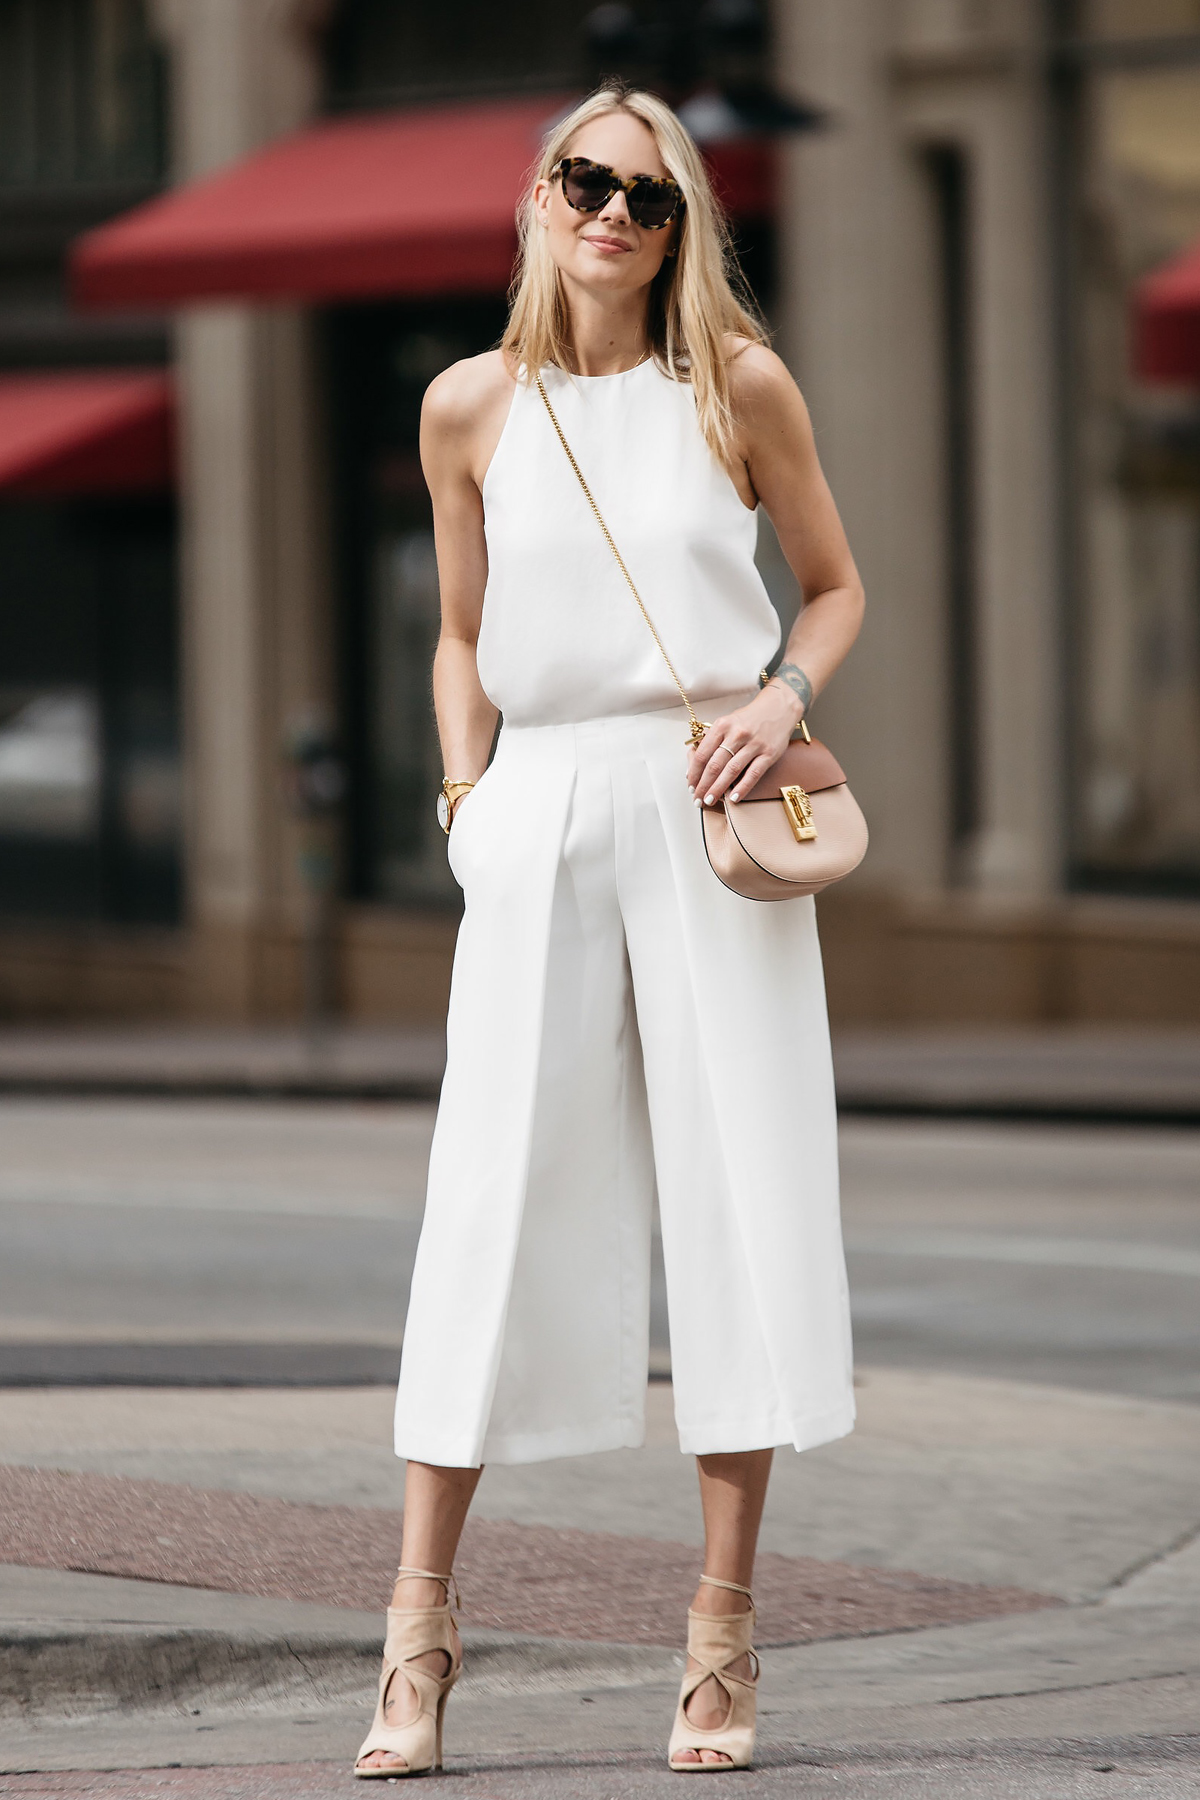 Fashion Jackson, Dallas Blogger, Fashion Blogger, Street Style, Everlane White Tank, White Wide Leg Culottes, Chloe Drew Handbag, Aquazzura Sexy Thang Heels